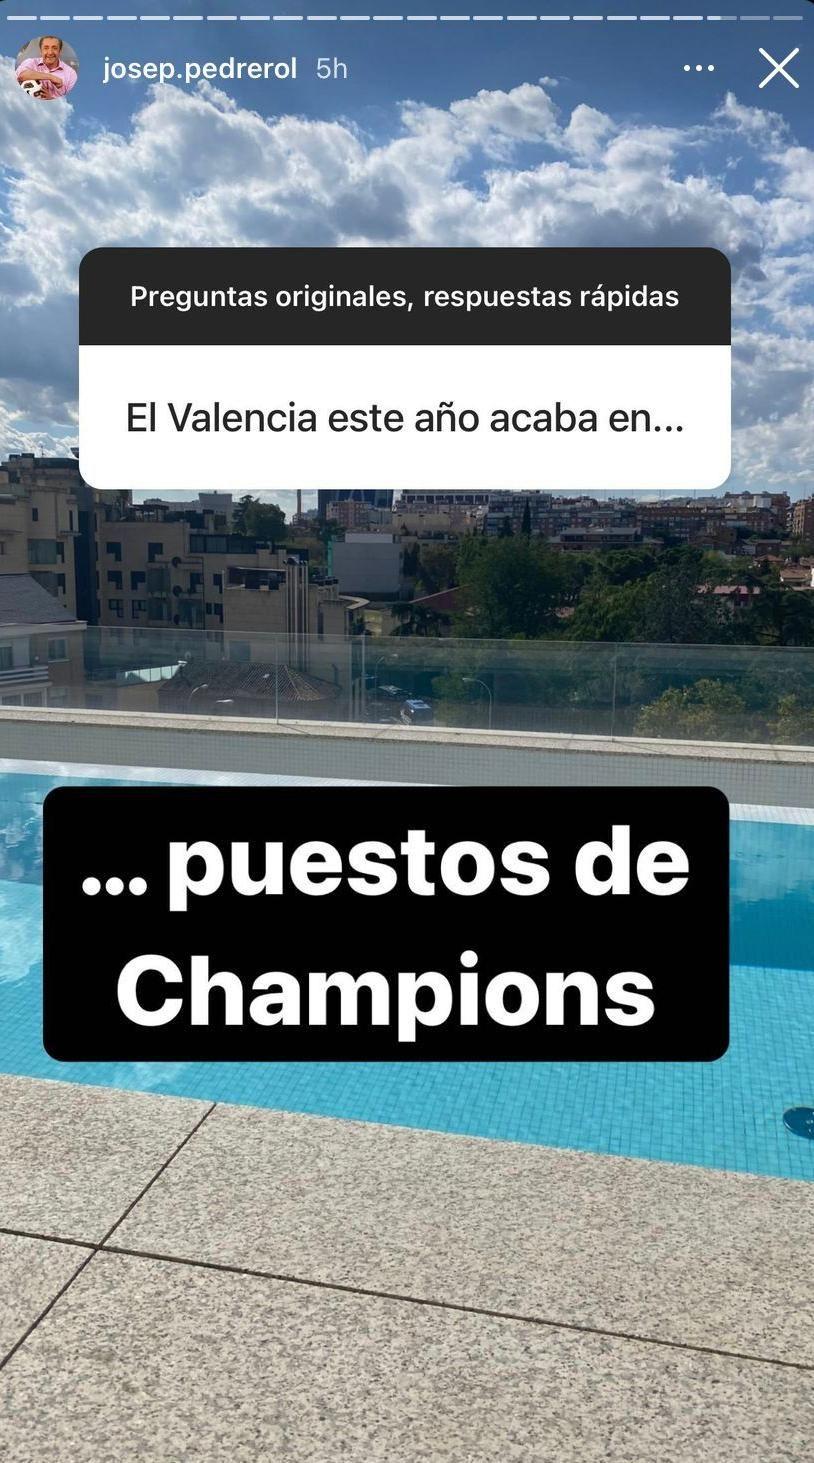 Pedrerol, sobre el futuro del Valencia CF